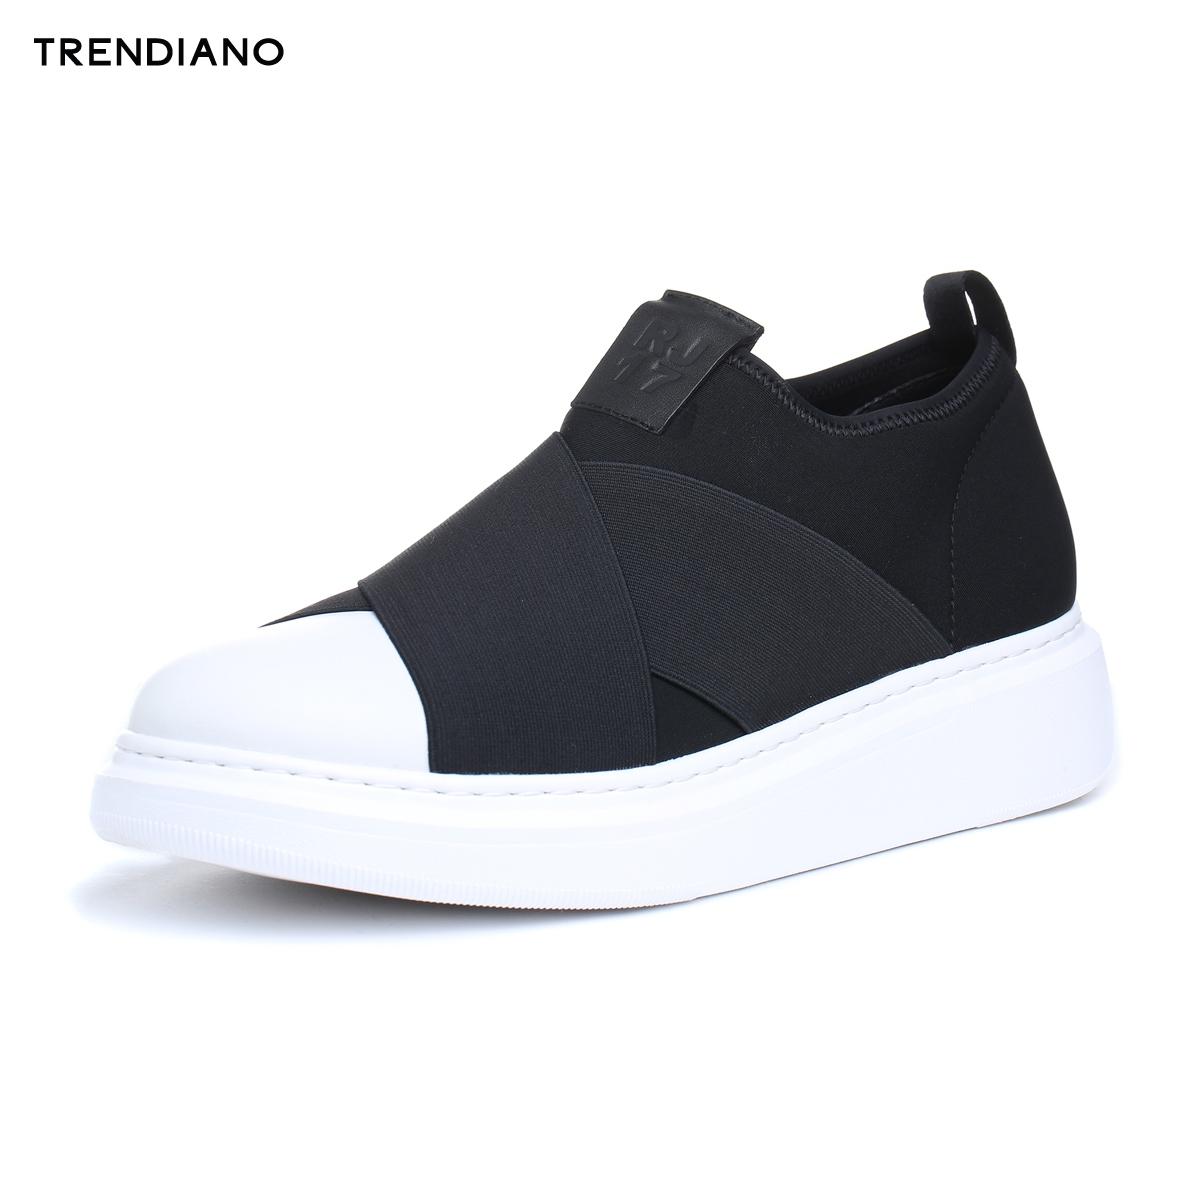 TRENDIANO新男装夏装潮流轻量拼接字母厚底低帮鞋板鞋3EA151802P